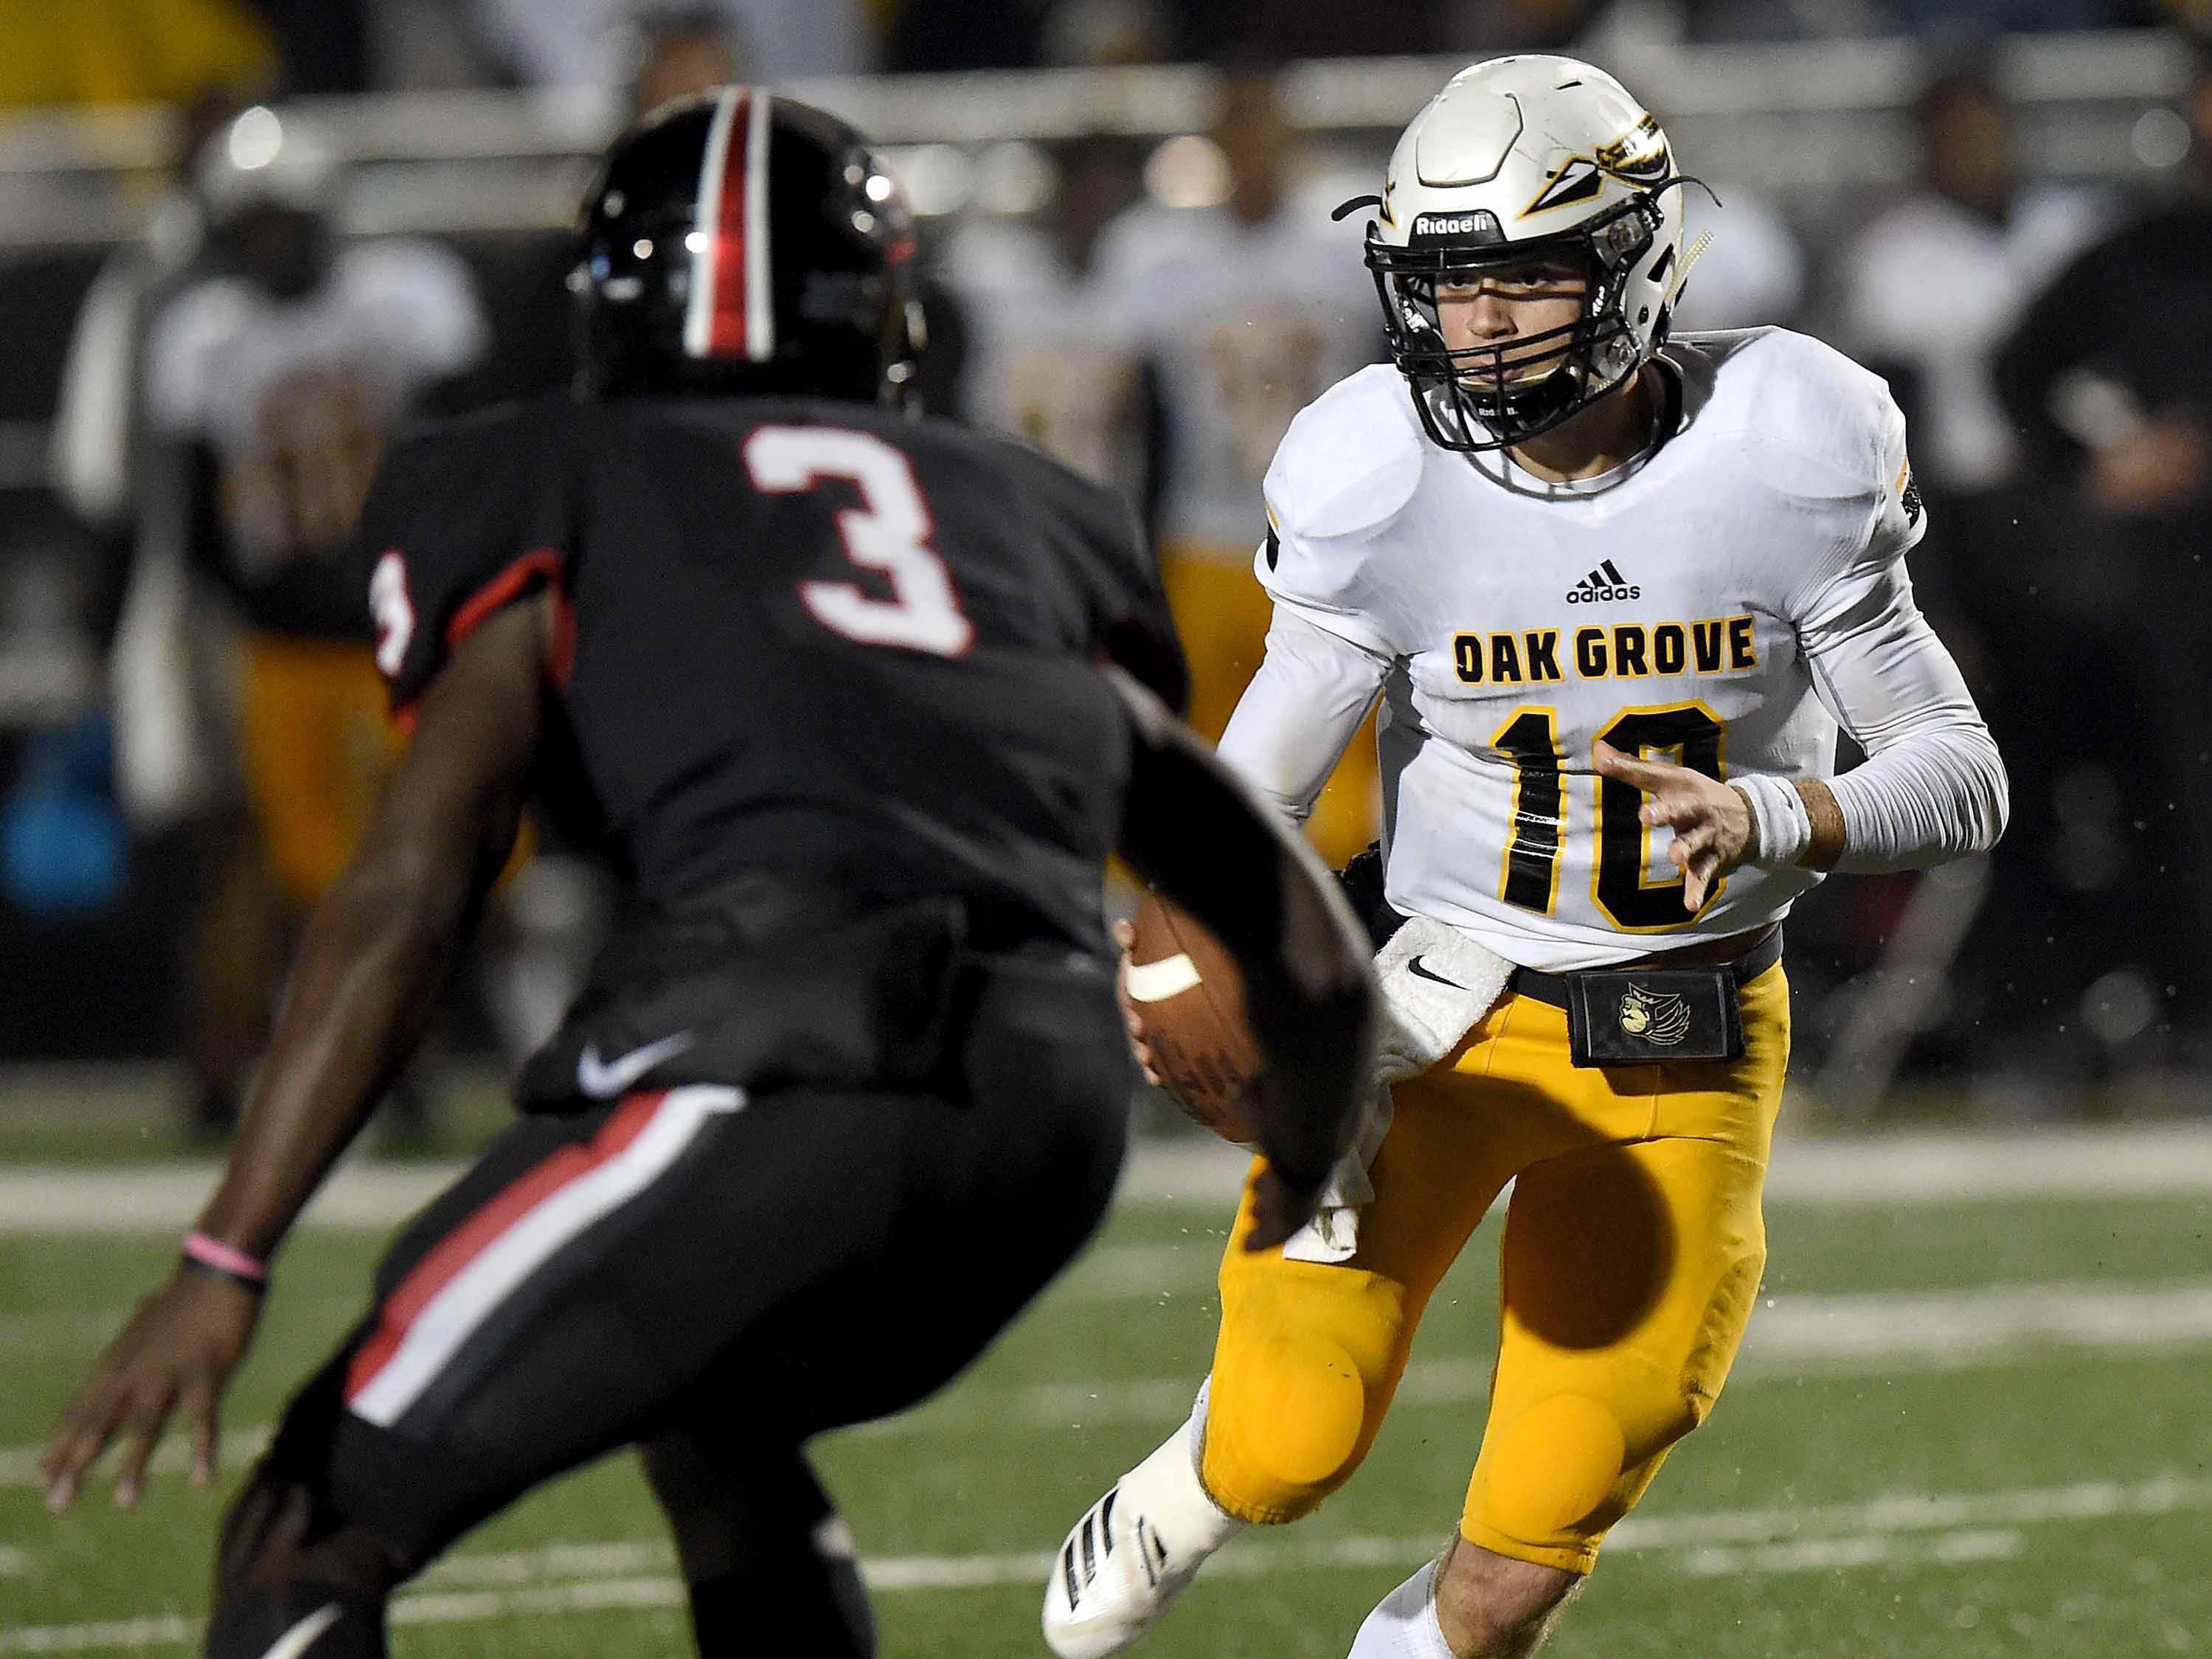 Oak Grove quarterback John Rhys Plumlee (10) runs the option against Brandon in the MHSAA Class 6A South State Championship on Friday, November 23, 2018, at Brandon High School in Brandon, Miss.